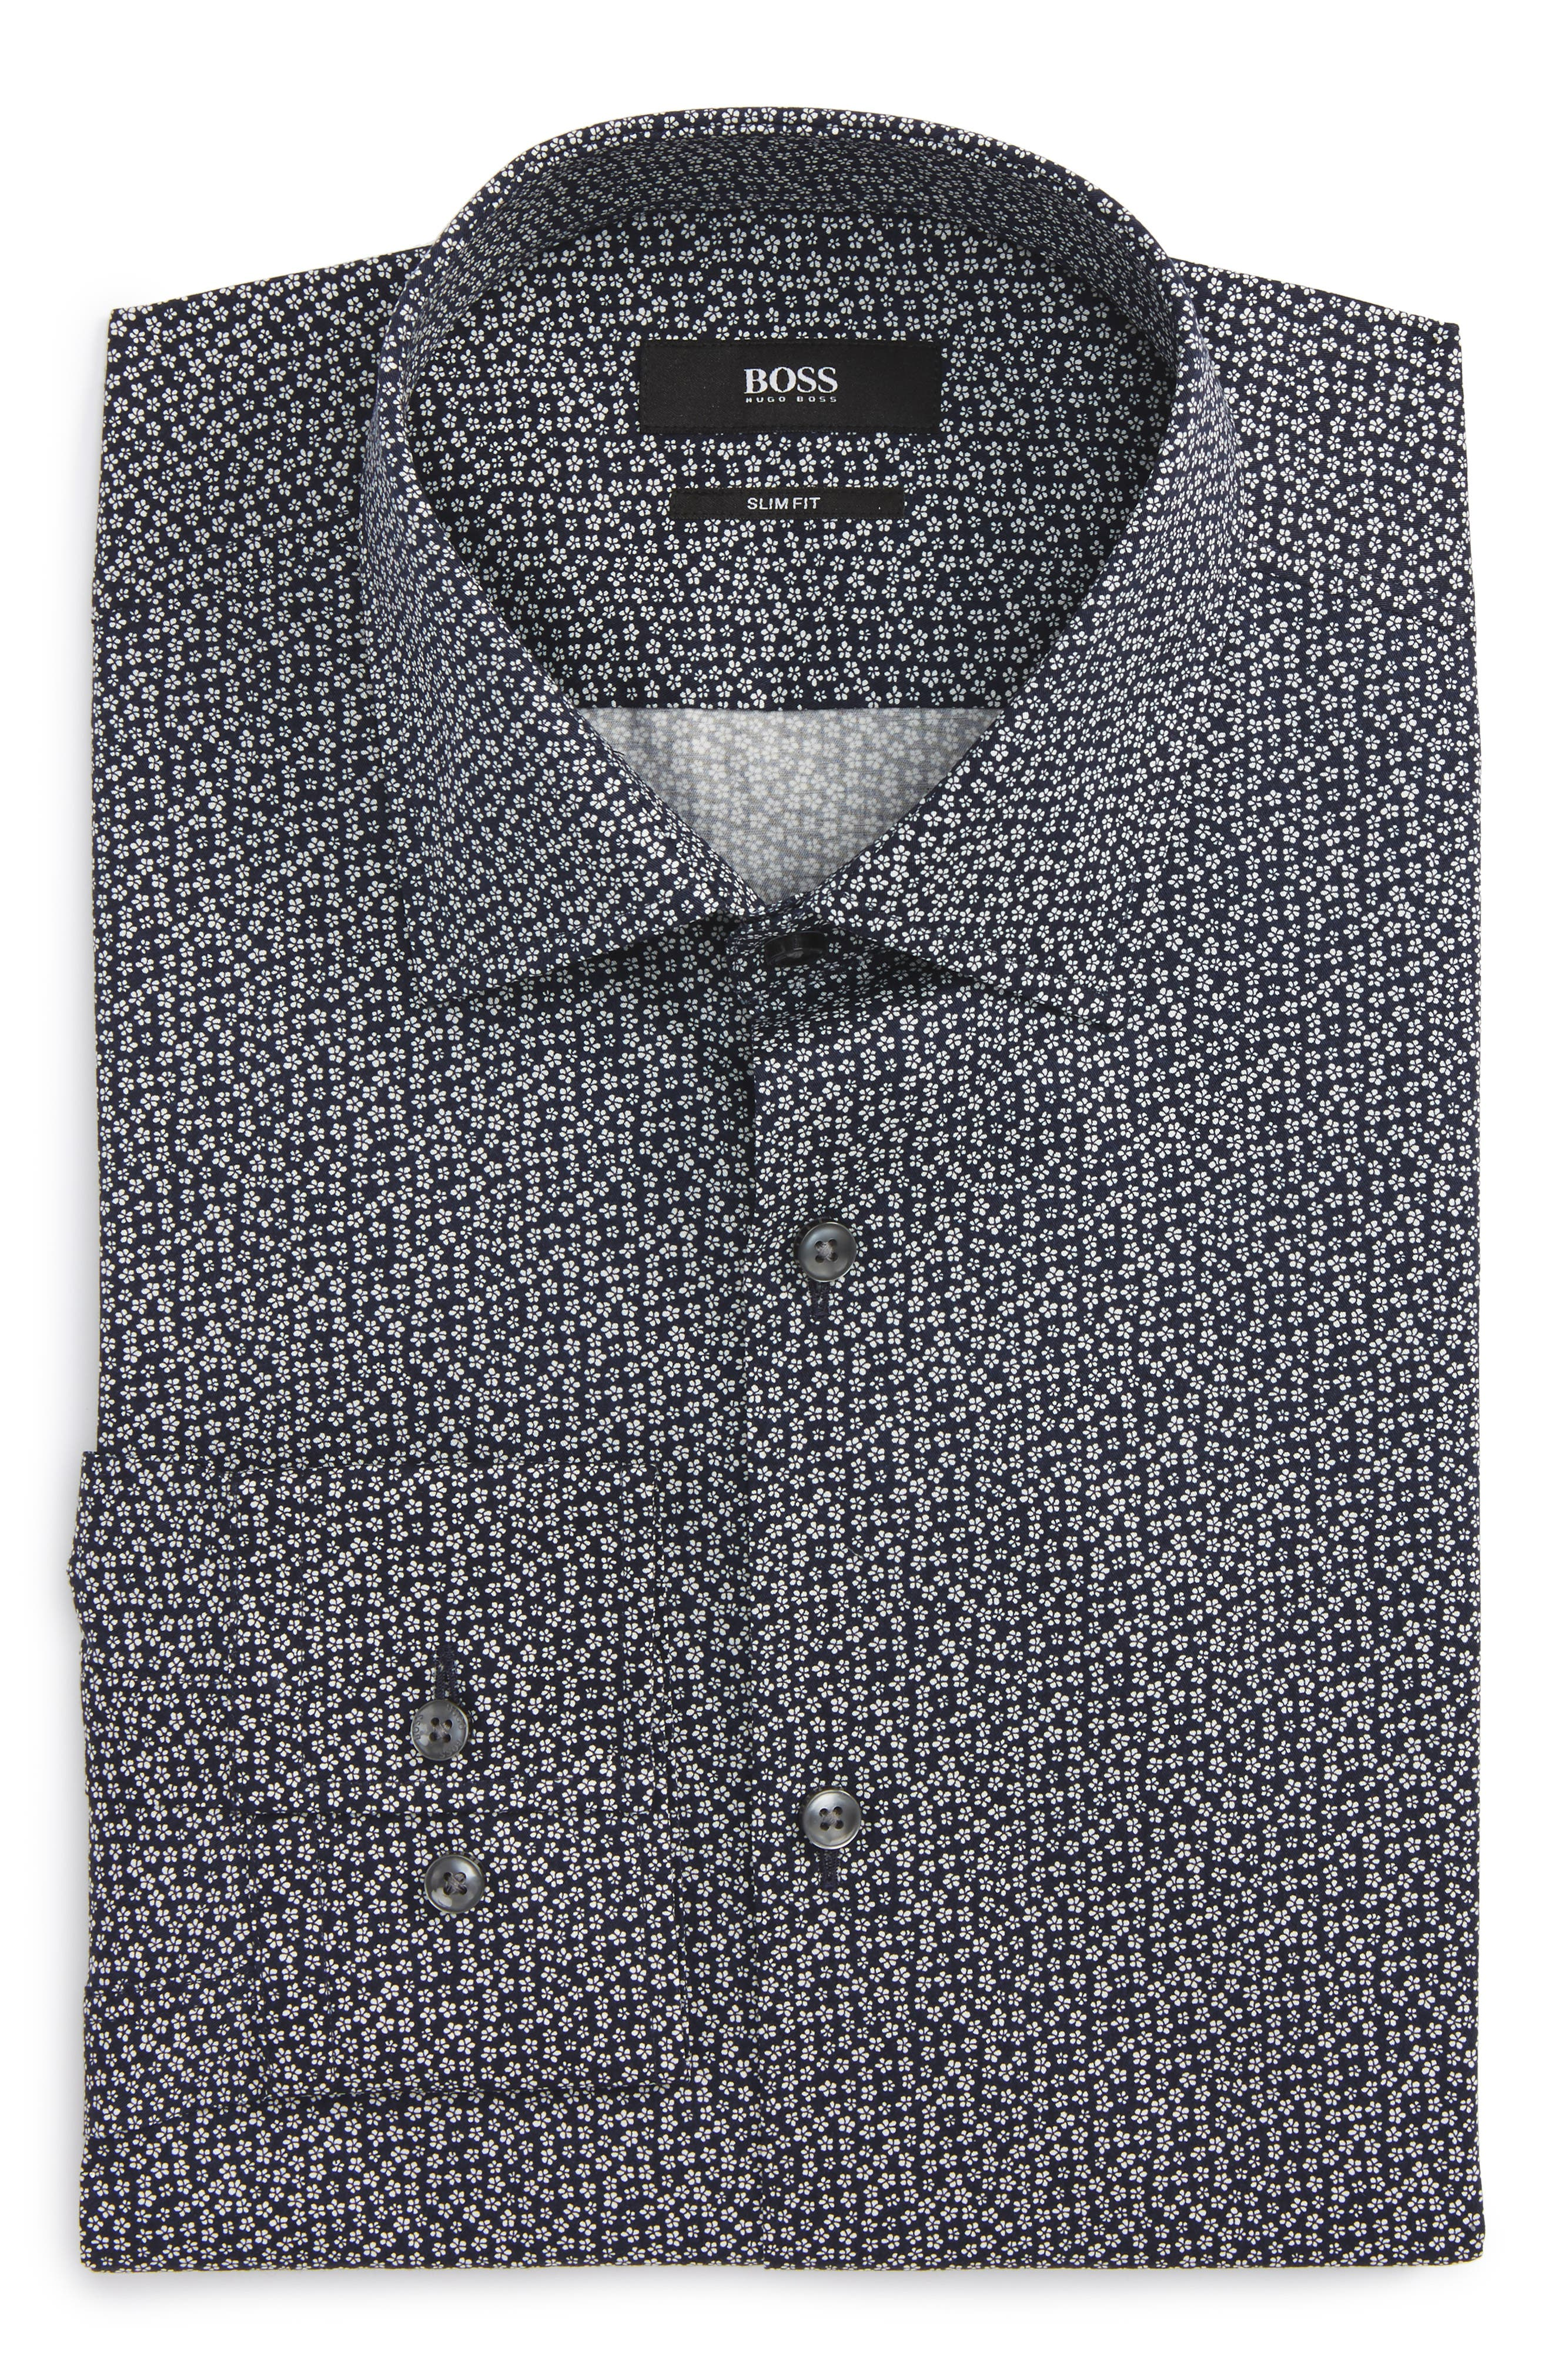 Slim Fit Floral Dress Shirt,                             Main thumbnail 1, color,                             Navy